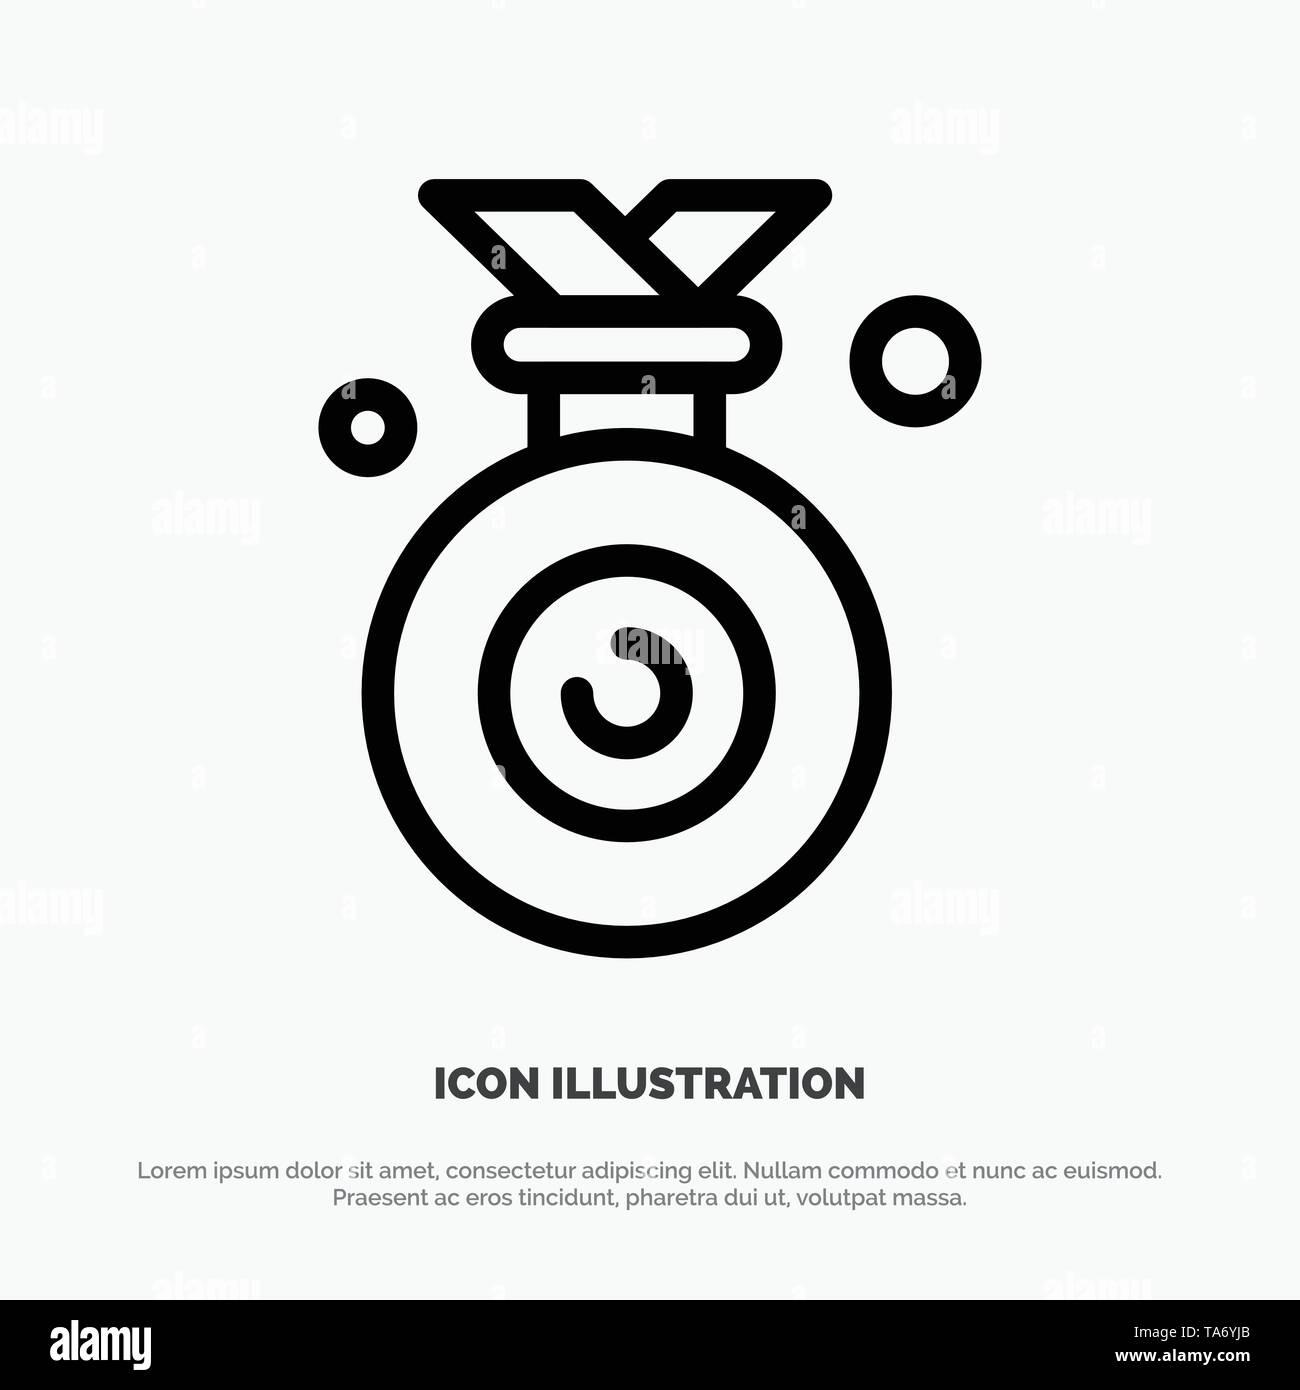 Medal, Olympic, Winner, Won Line Icon Vector - Stock Vector